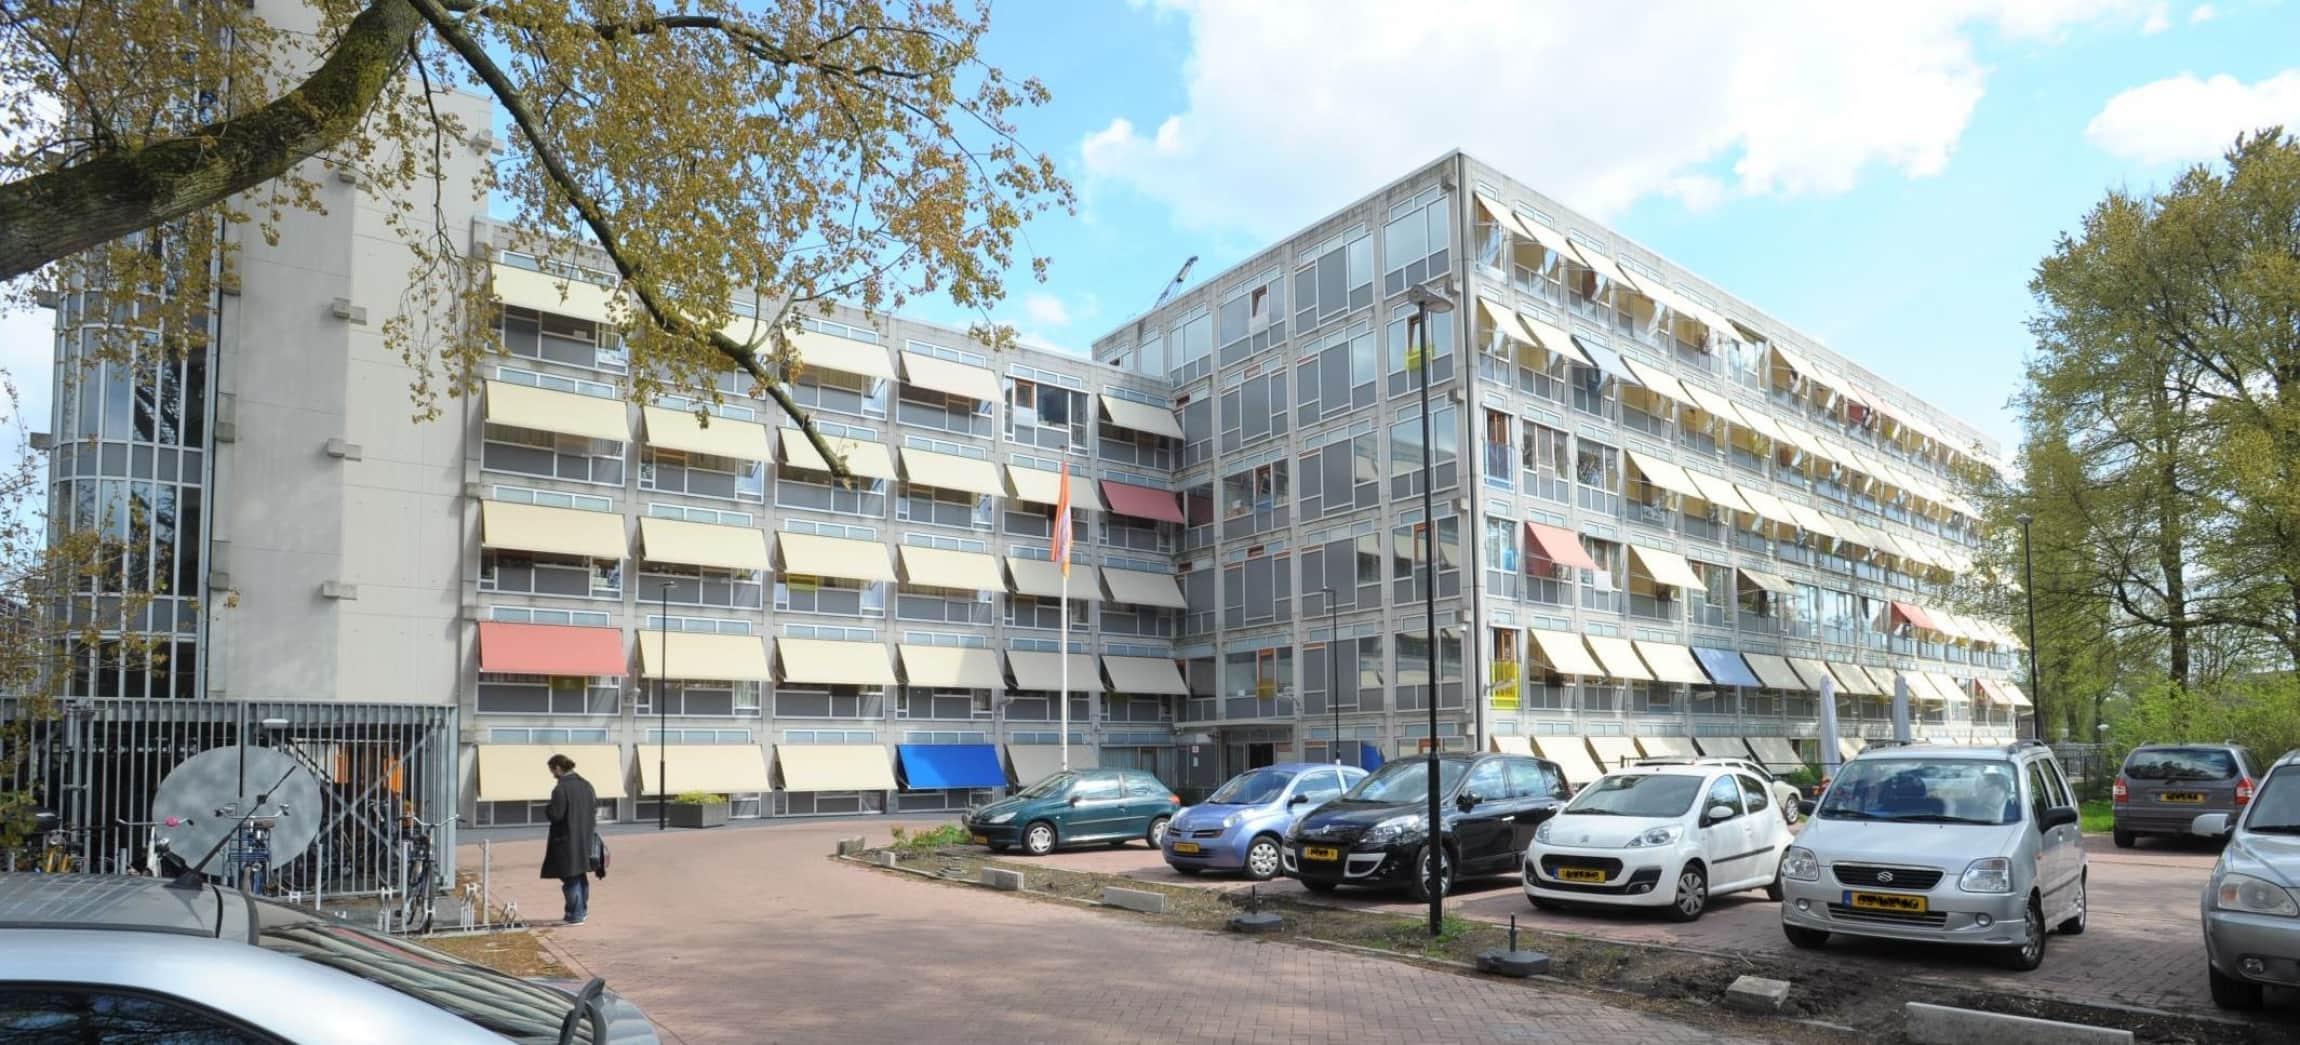 De Drie Hoven Amsterdam - Connect Generations